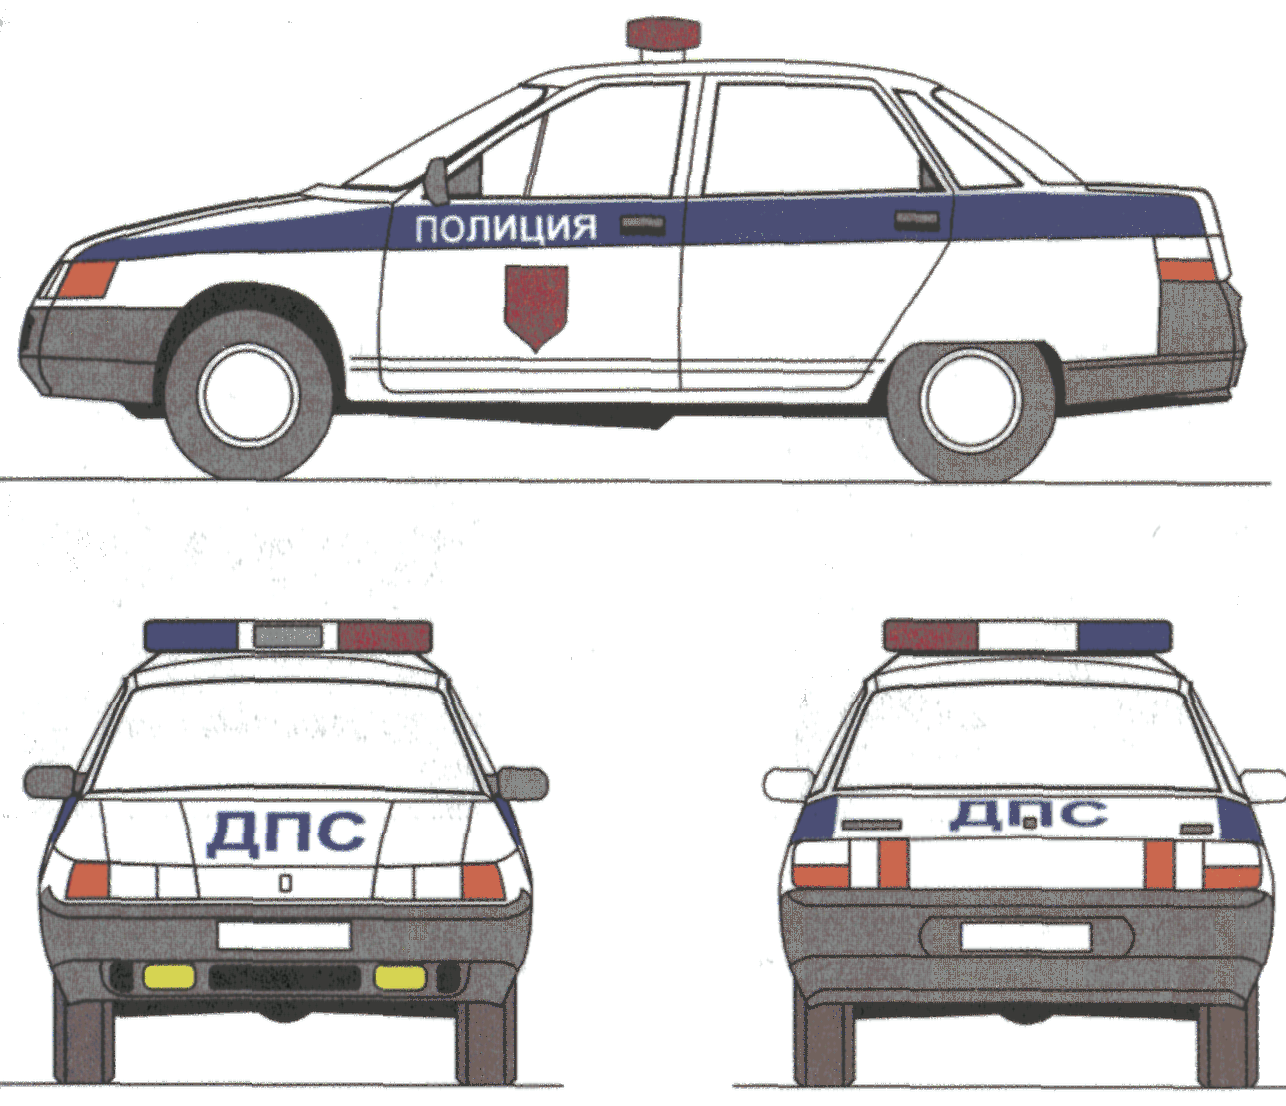 РИСУНОК А.10 (К ГОСТ Р 50574-2002)